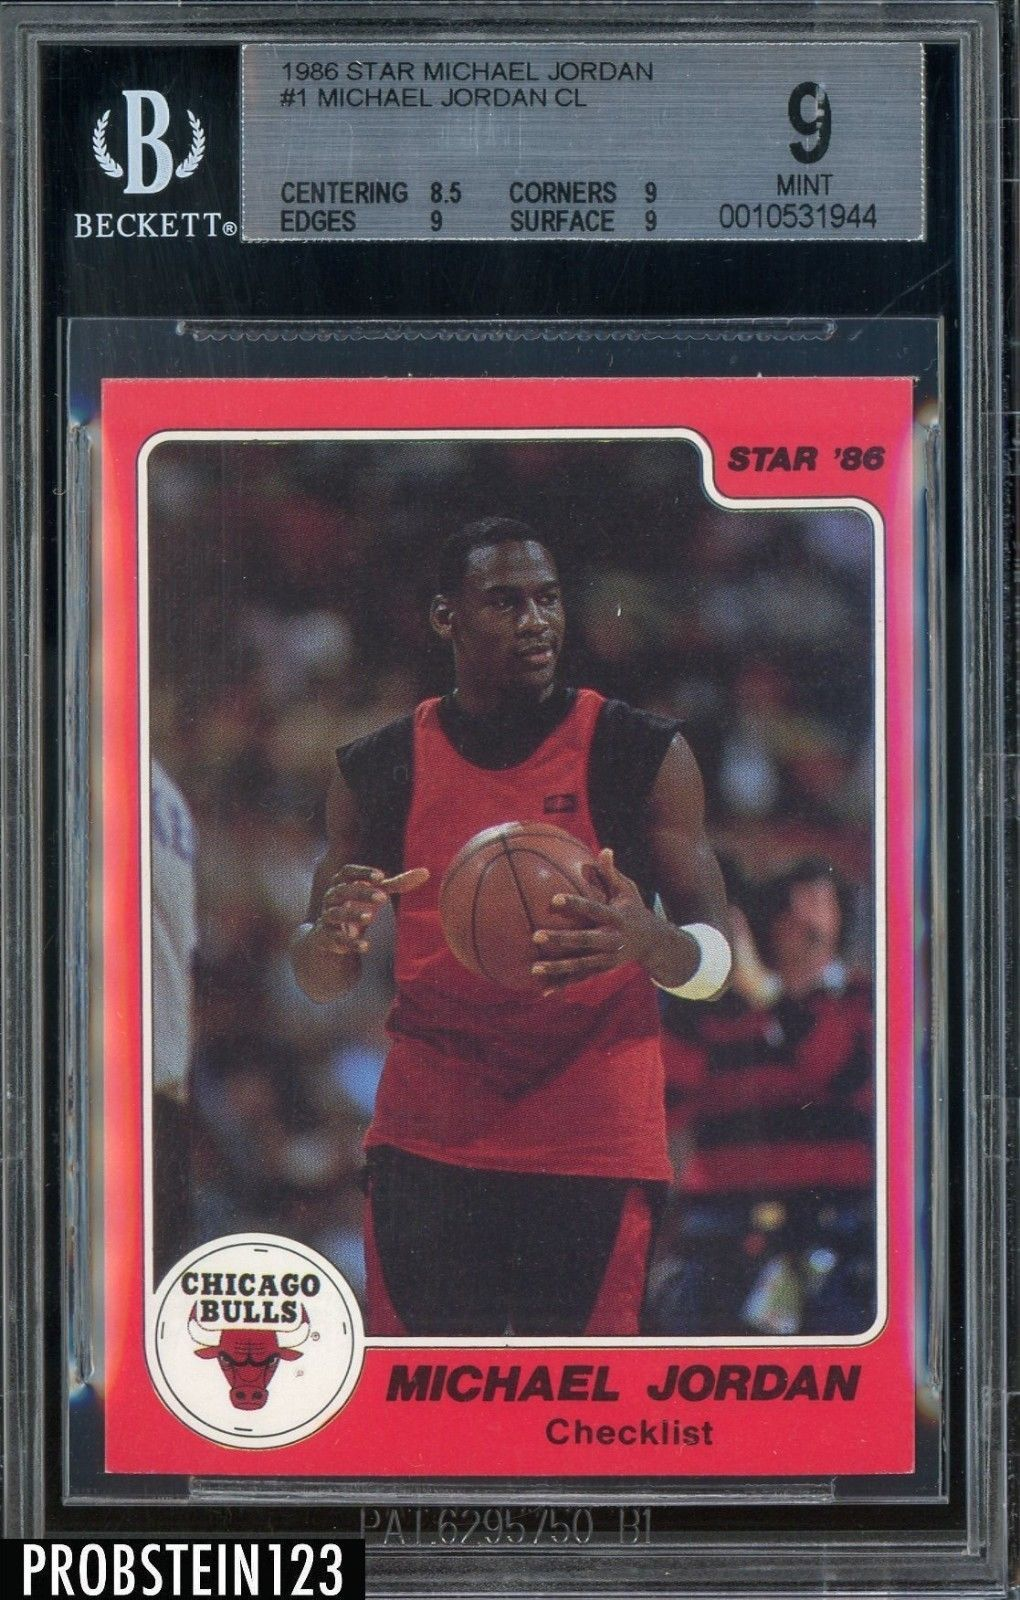 1986 star basketball 1 michael jordan chicago bulls rc